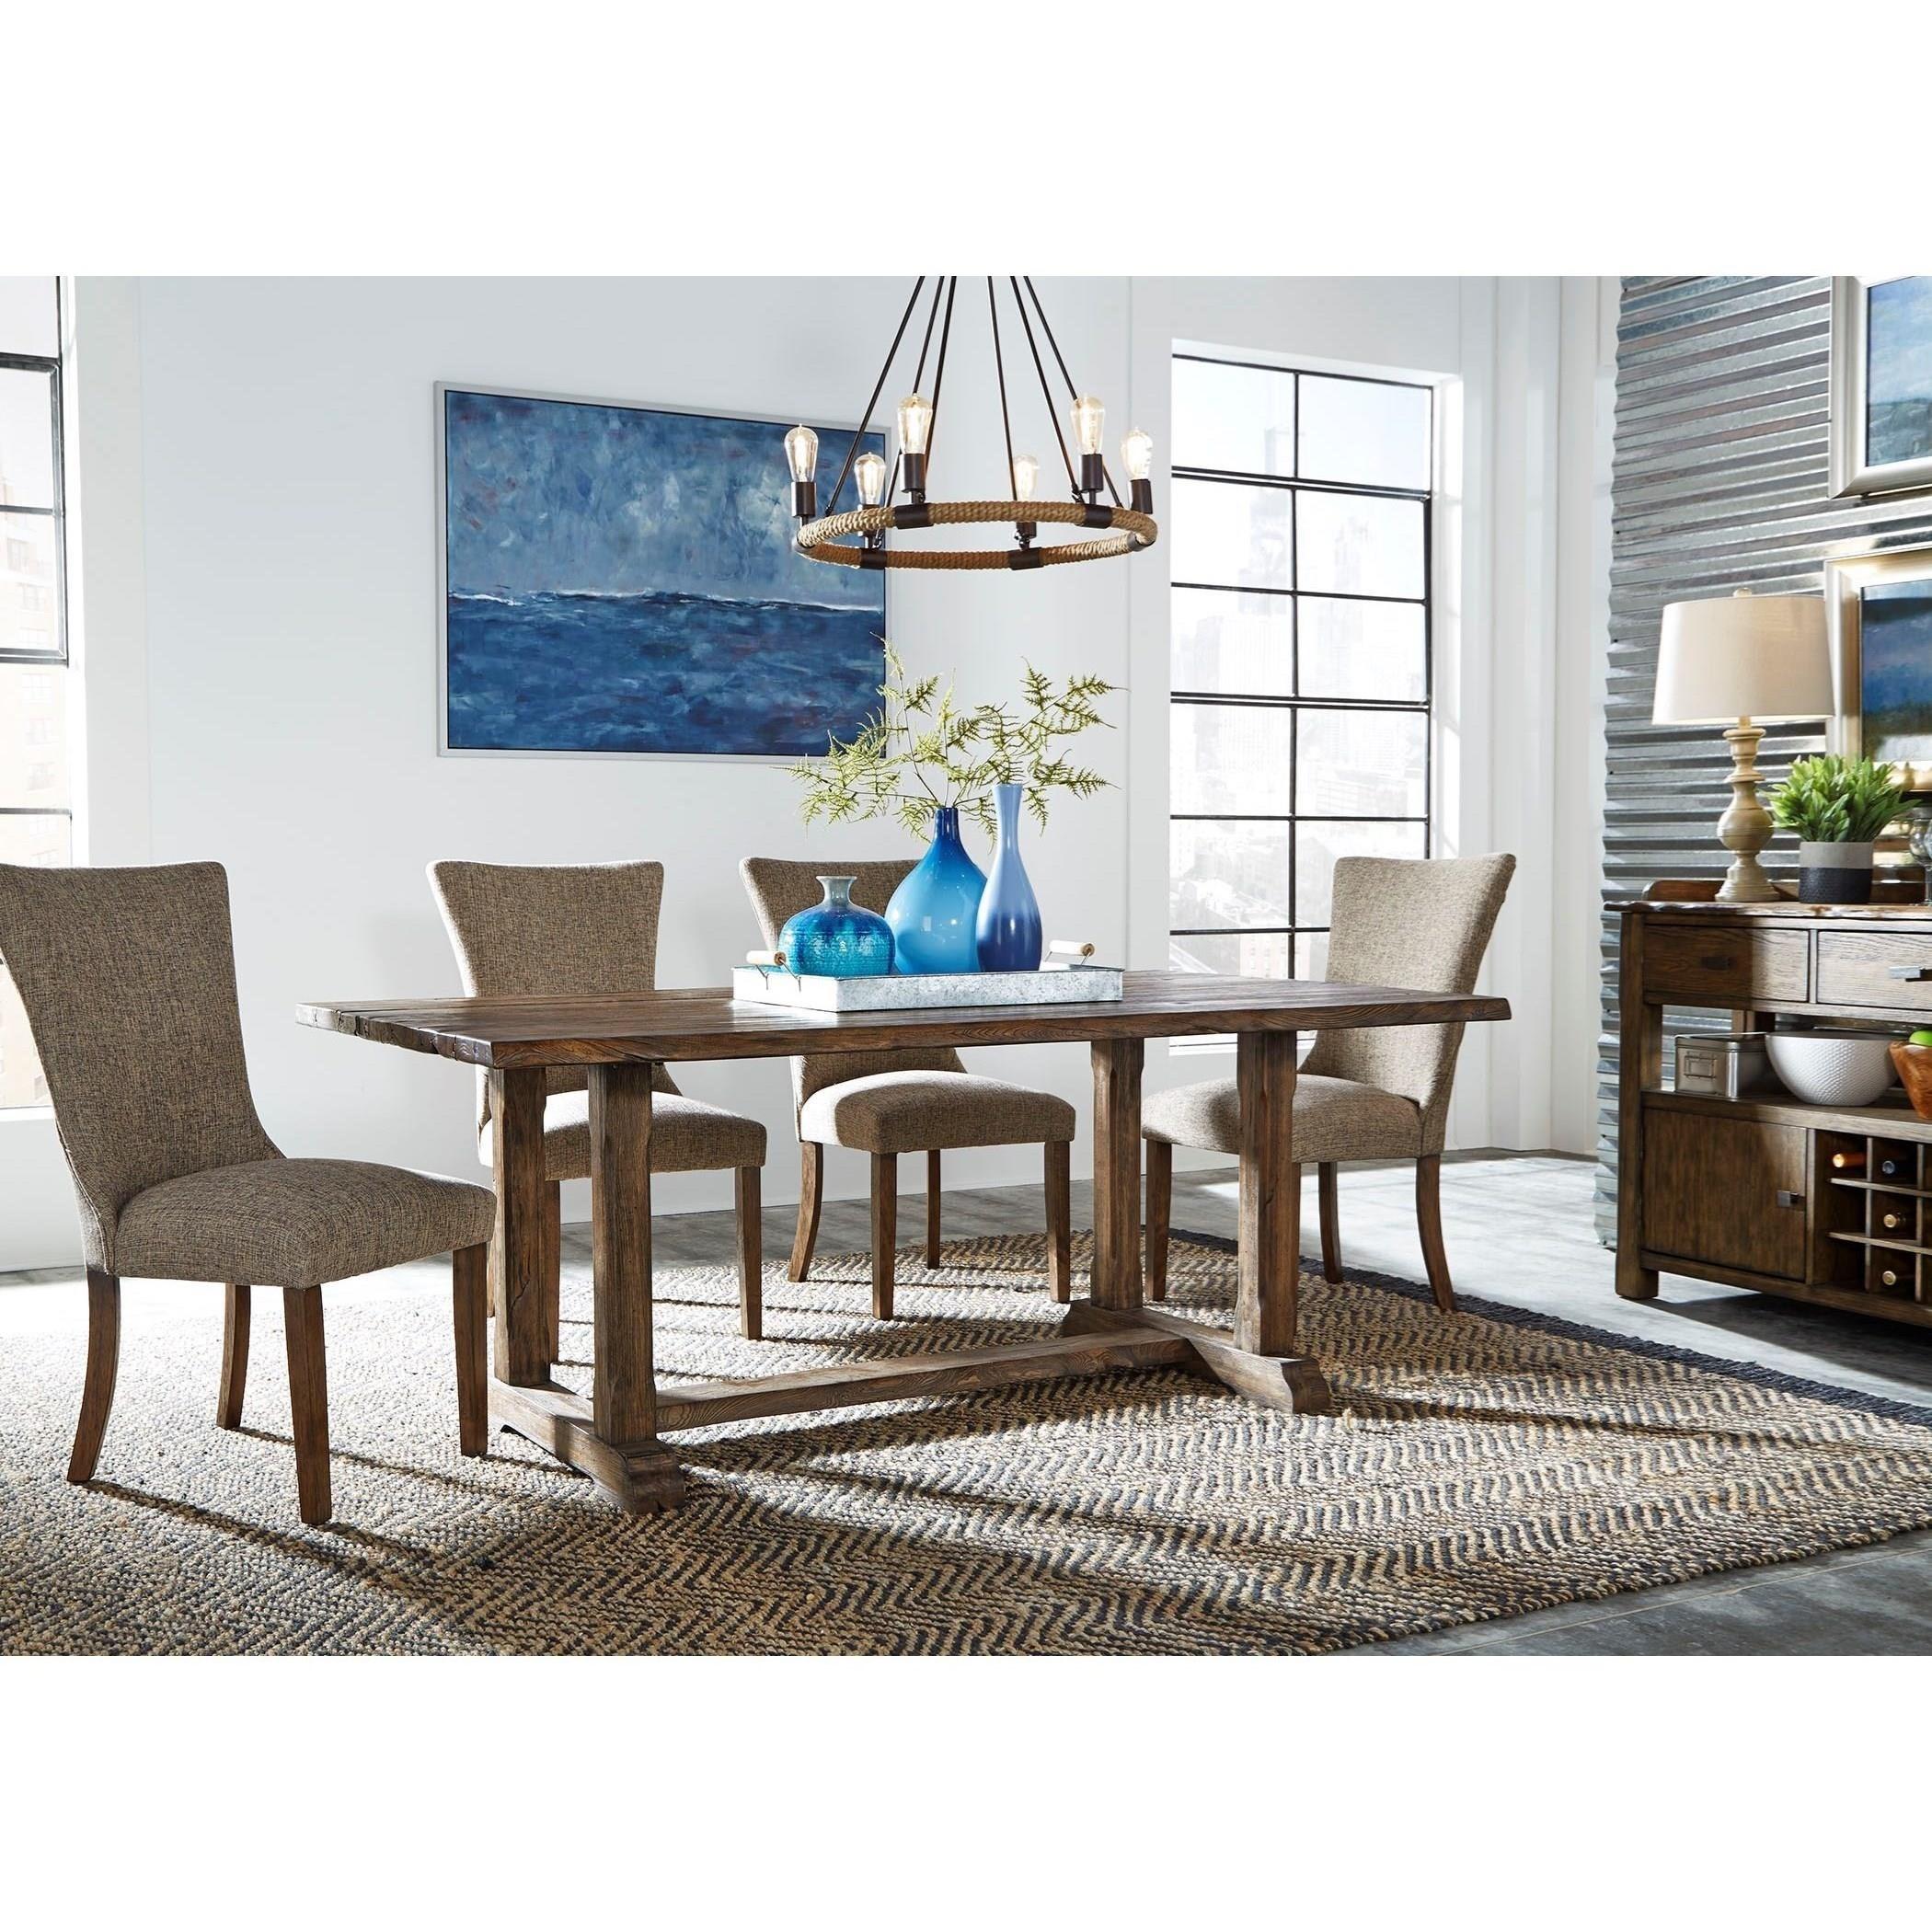 Liberty Furniture Havenbrook 5 Piece Trestle Dining Set